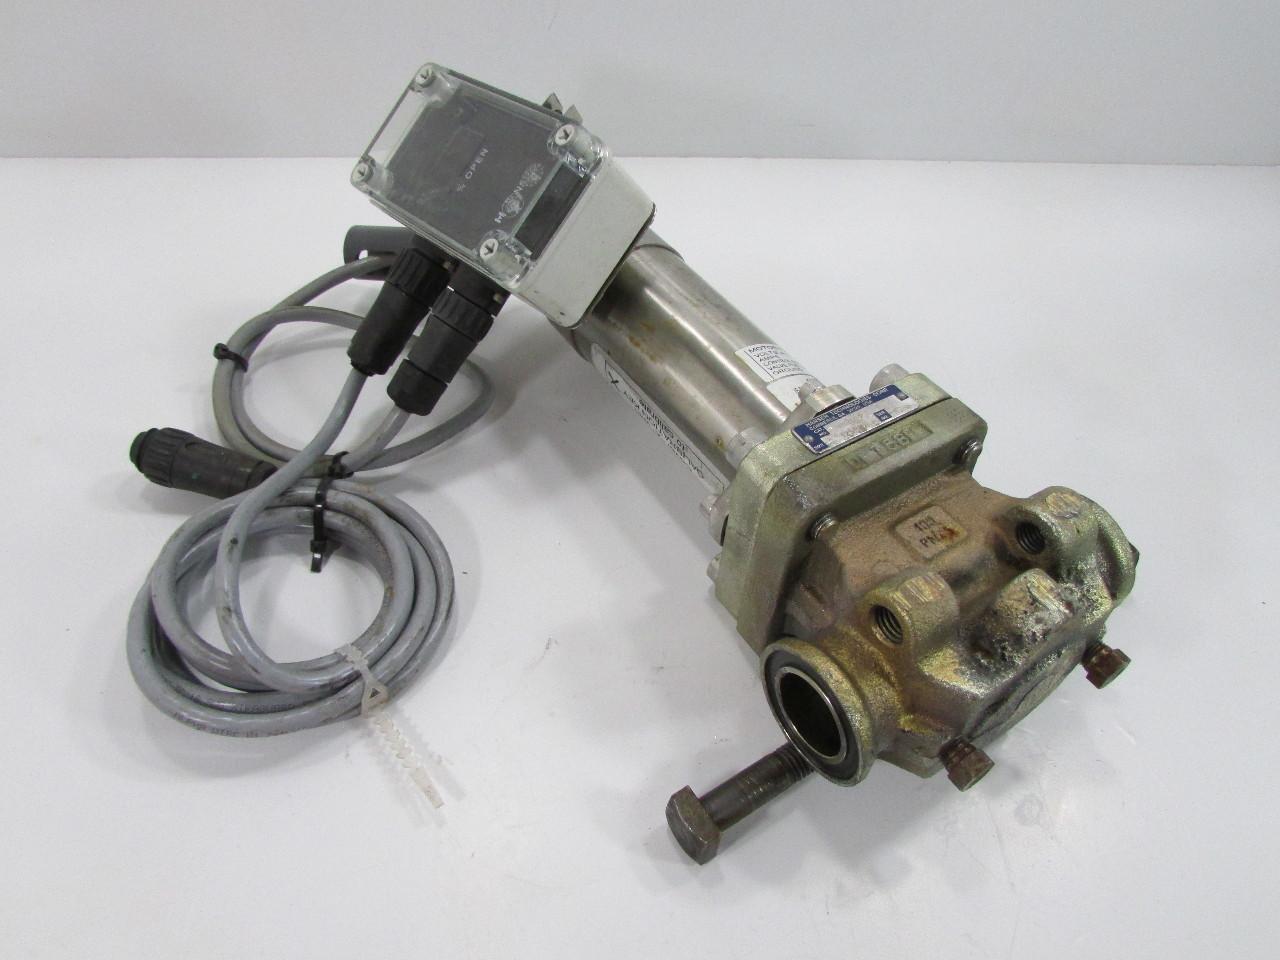 Hansen Sealed Motor Valve 1 Inch Hmmrc 2 Ebay